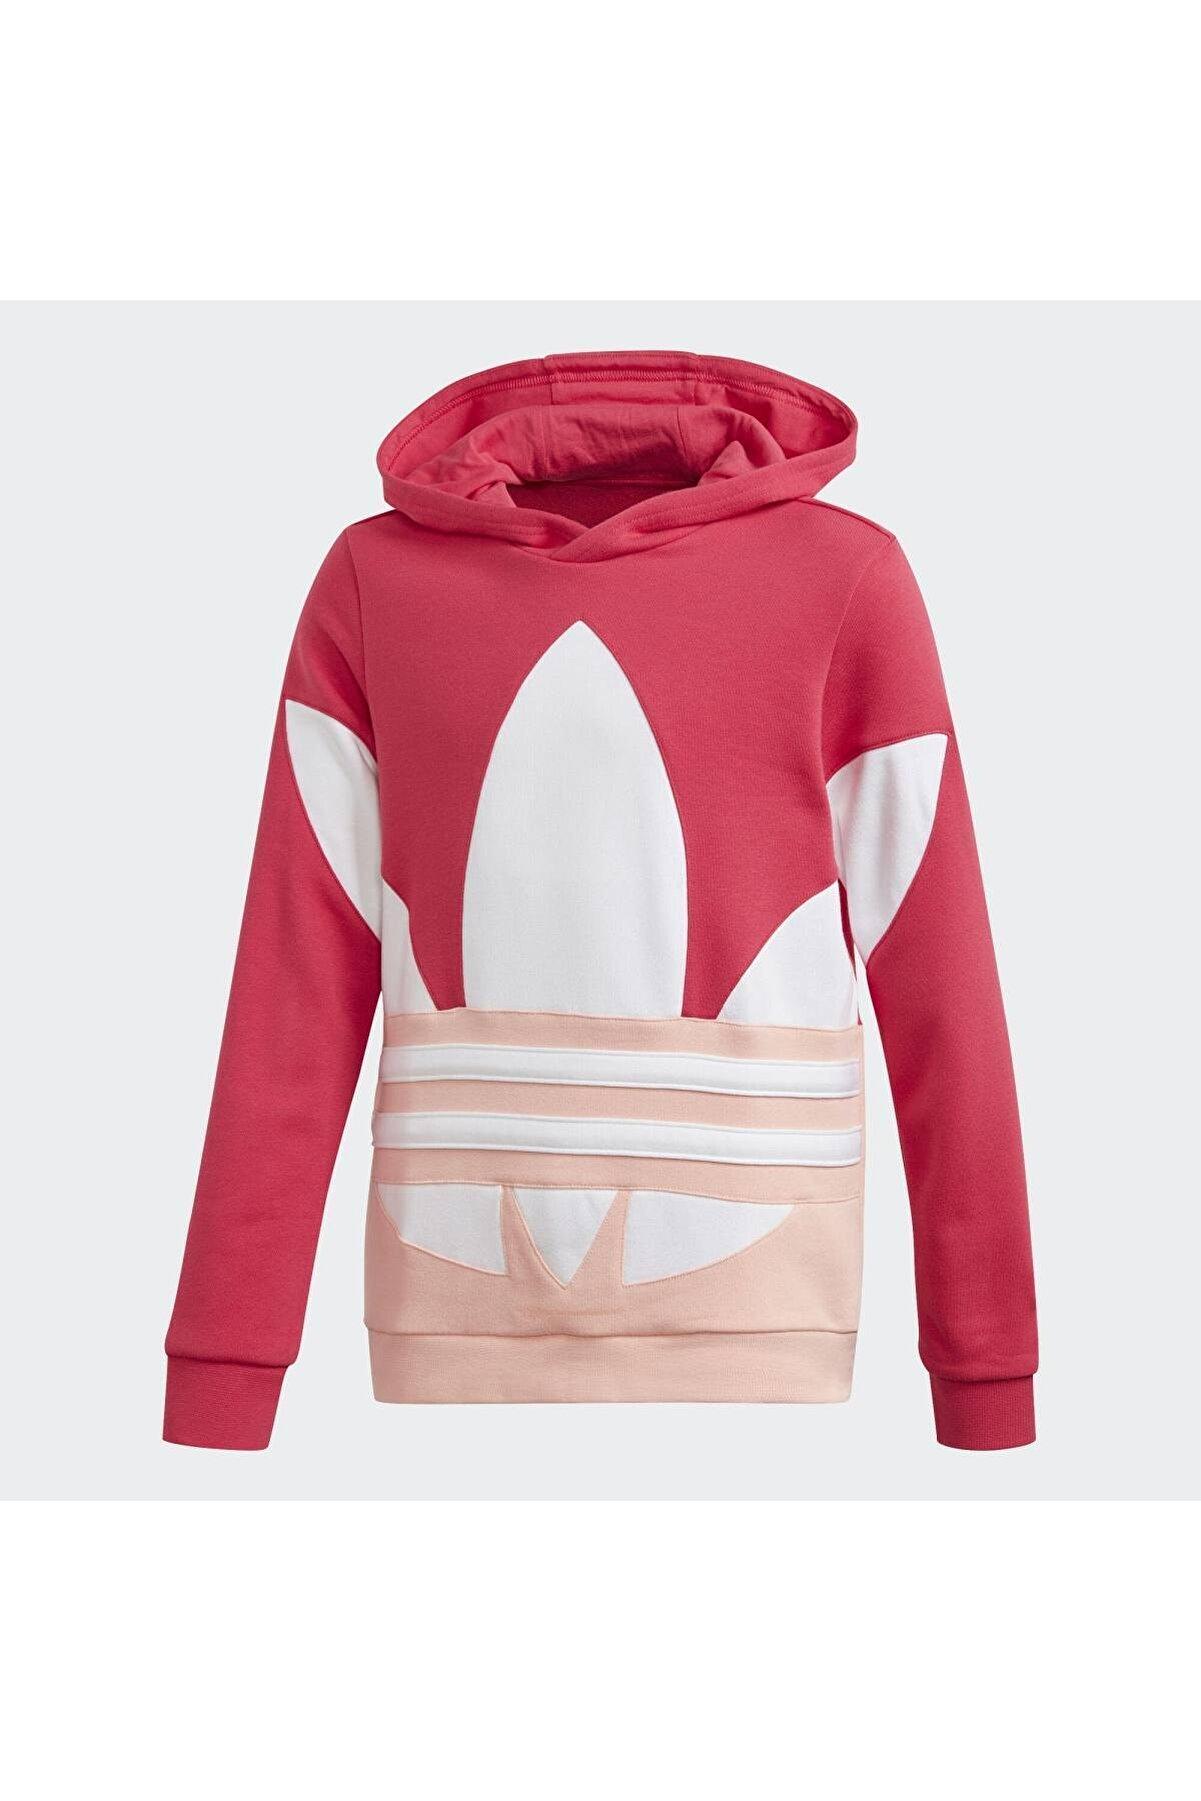 adidas Kız Çocuk Pembe Bıg Trf Hoodıe Spor Sweatshirt